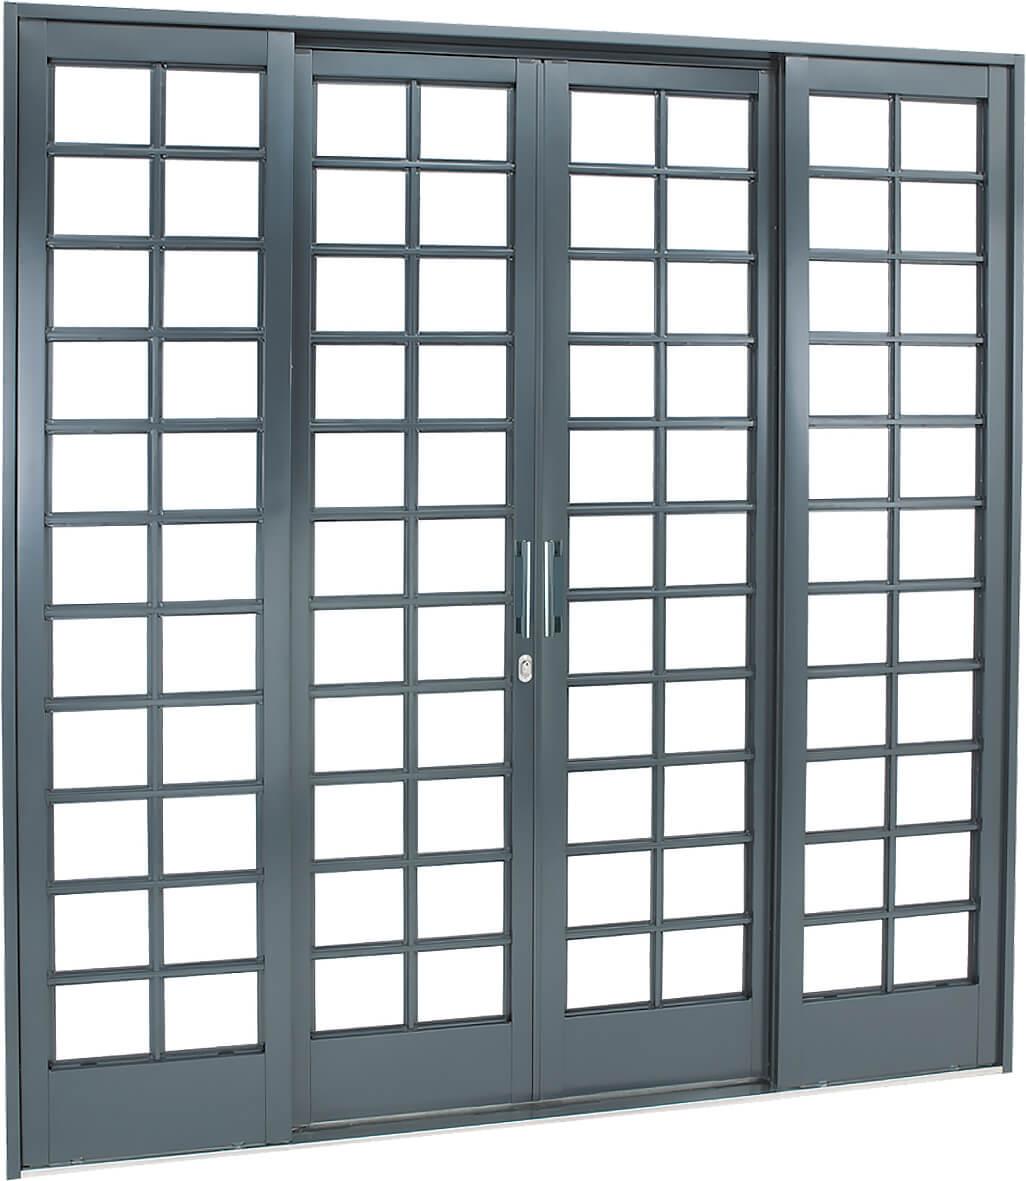 Belfort Porta de Correr - 2.17x2.00x0.12 Sasazaki Ref. 69.51.202-0